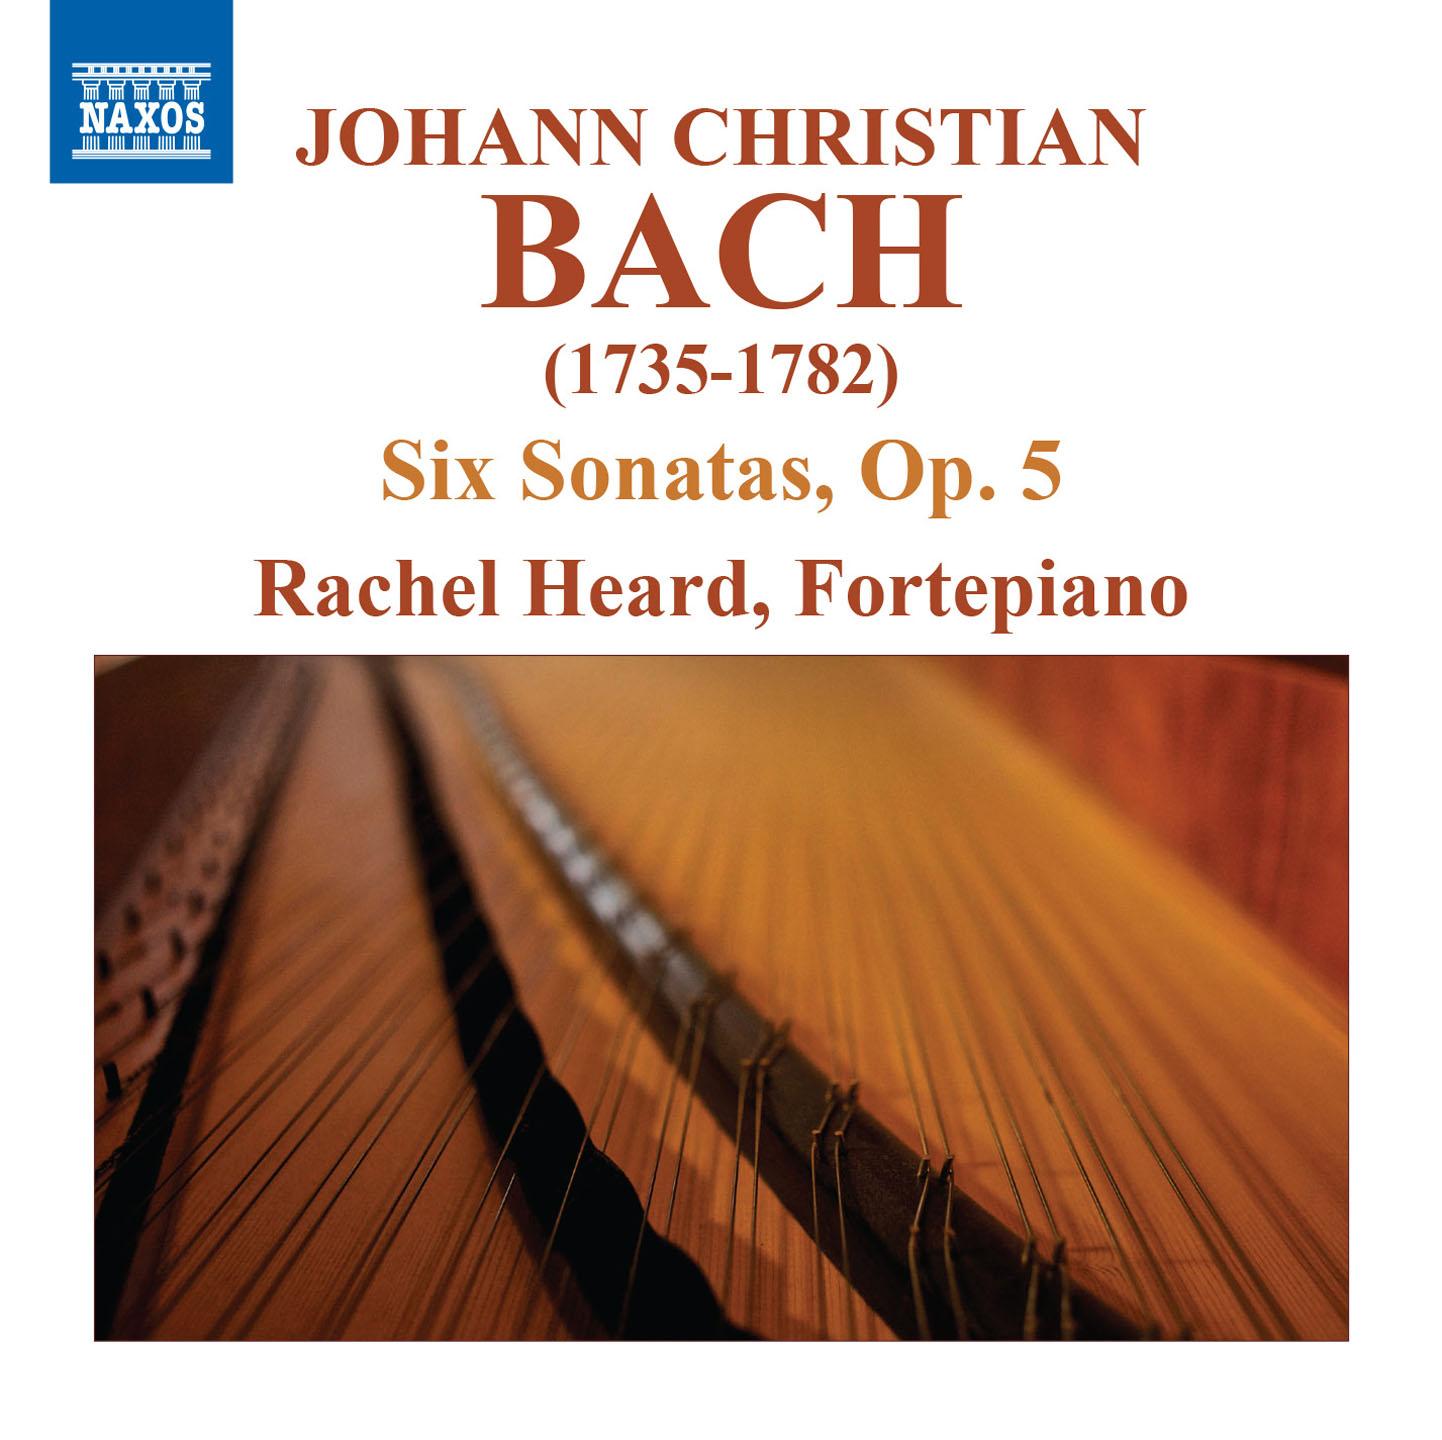 J.C. Bach: 6 Keyboard Sonatas, Op. 5